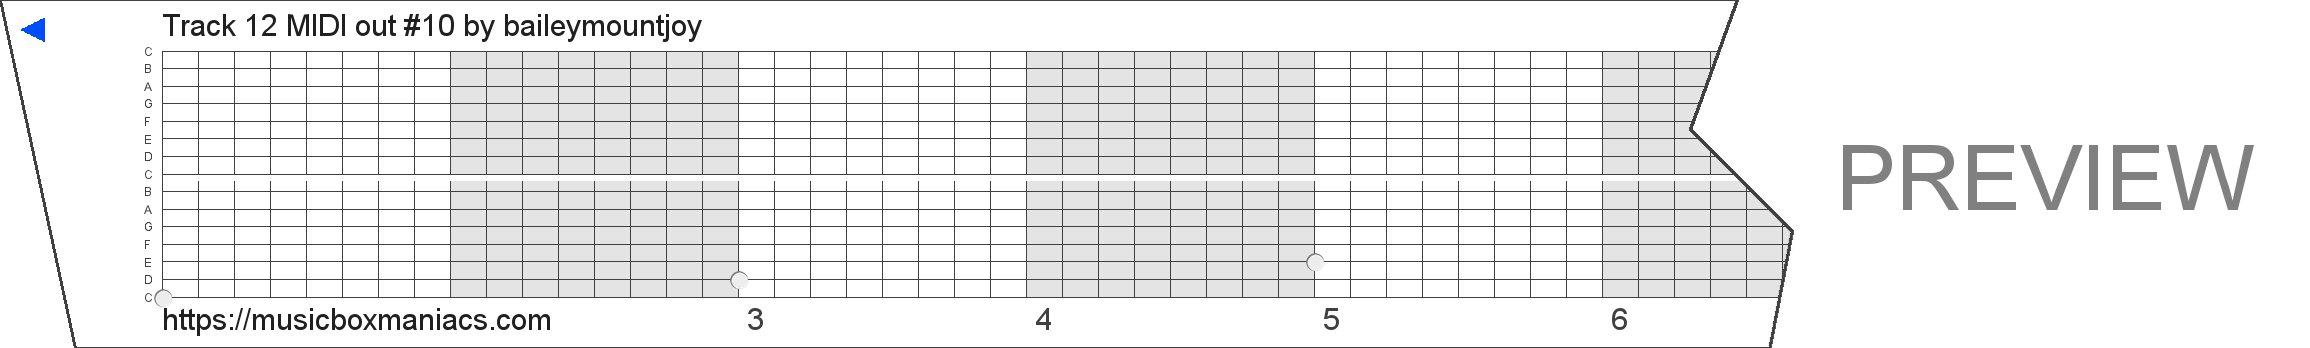 Track 12 MIDI out #10 15 note music box paper strip